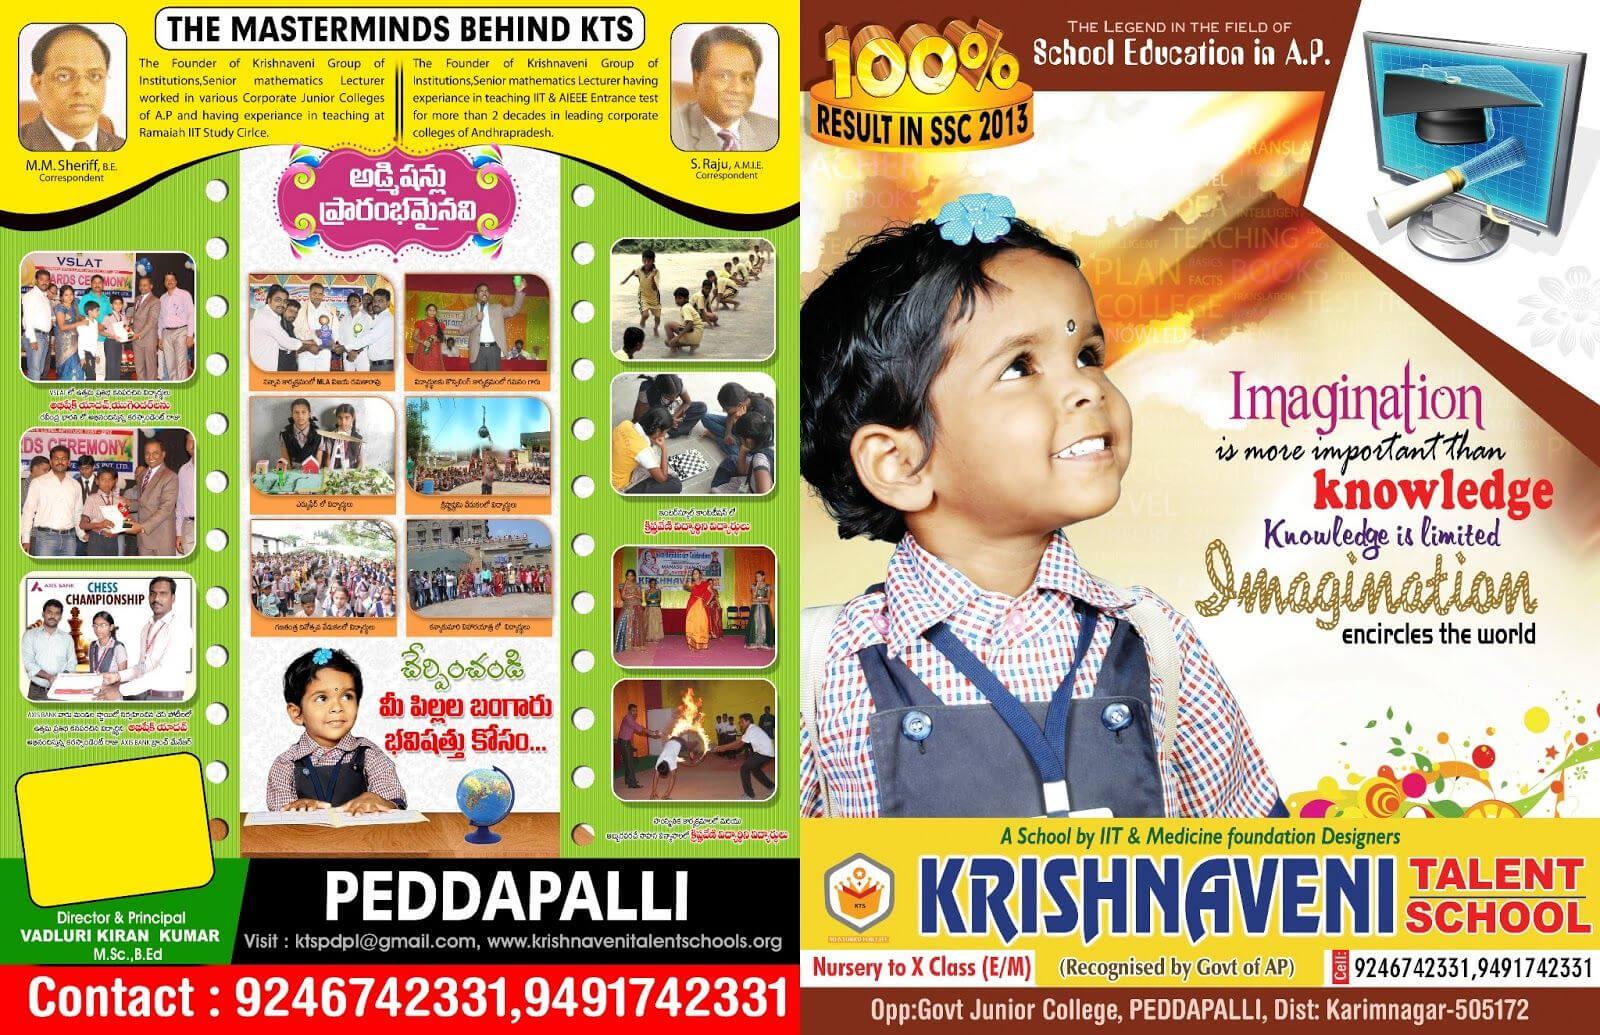 Krishnaveni Talent School Custom Brochure Design Template Pertaining To School Brochure Design Templates